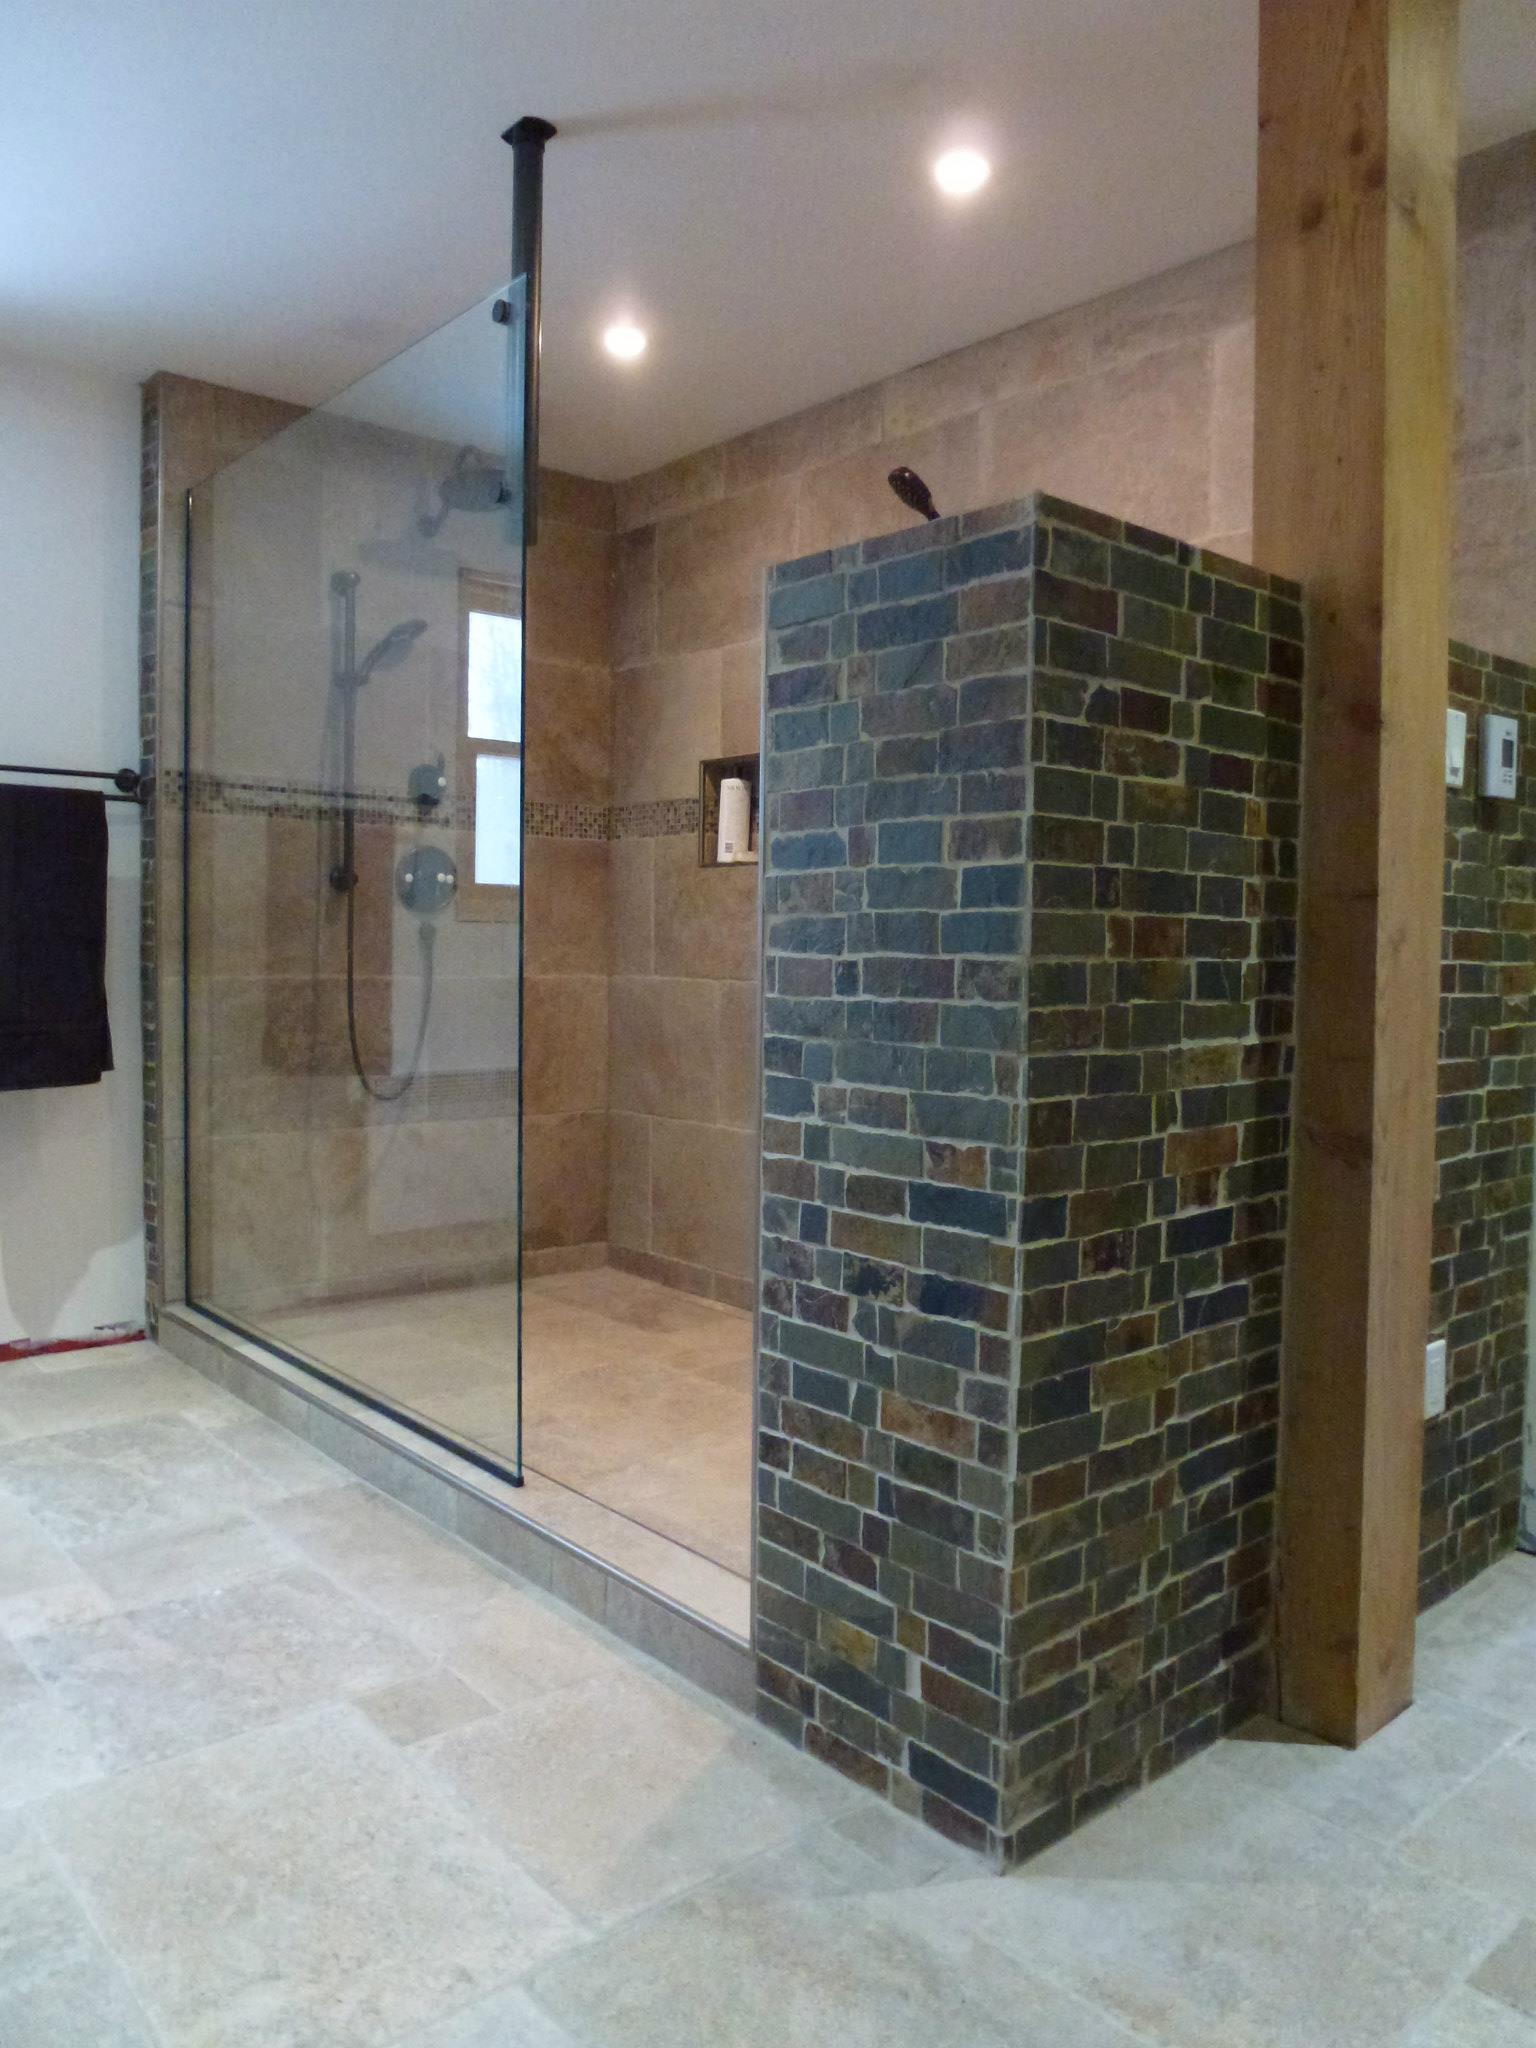 cuisines salles de bain leduc construction inc rigaud. Black Bedroom Furniture Sets. Home Design Ideas